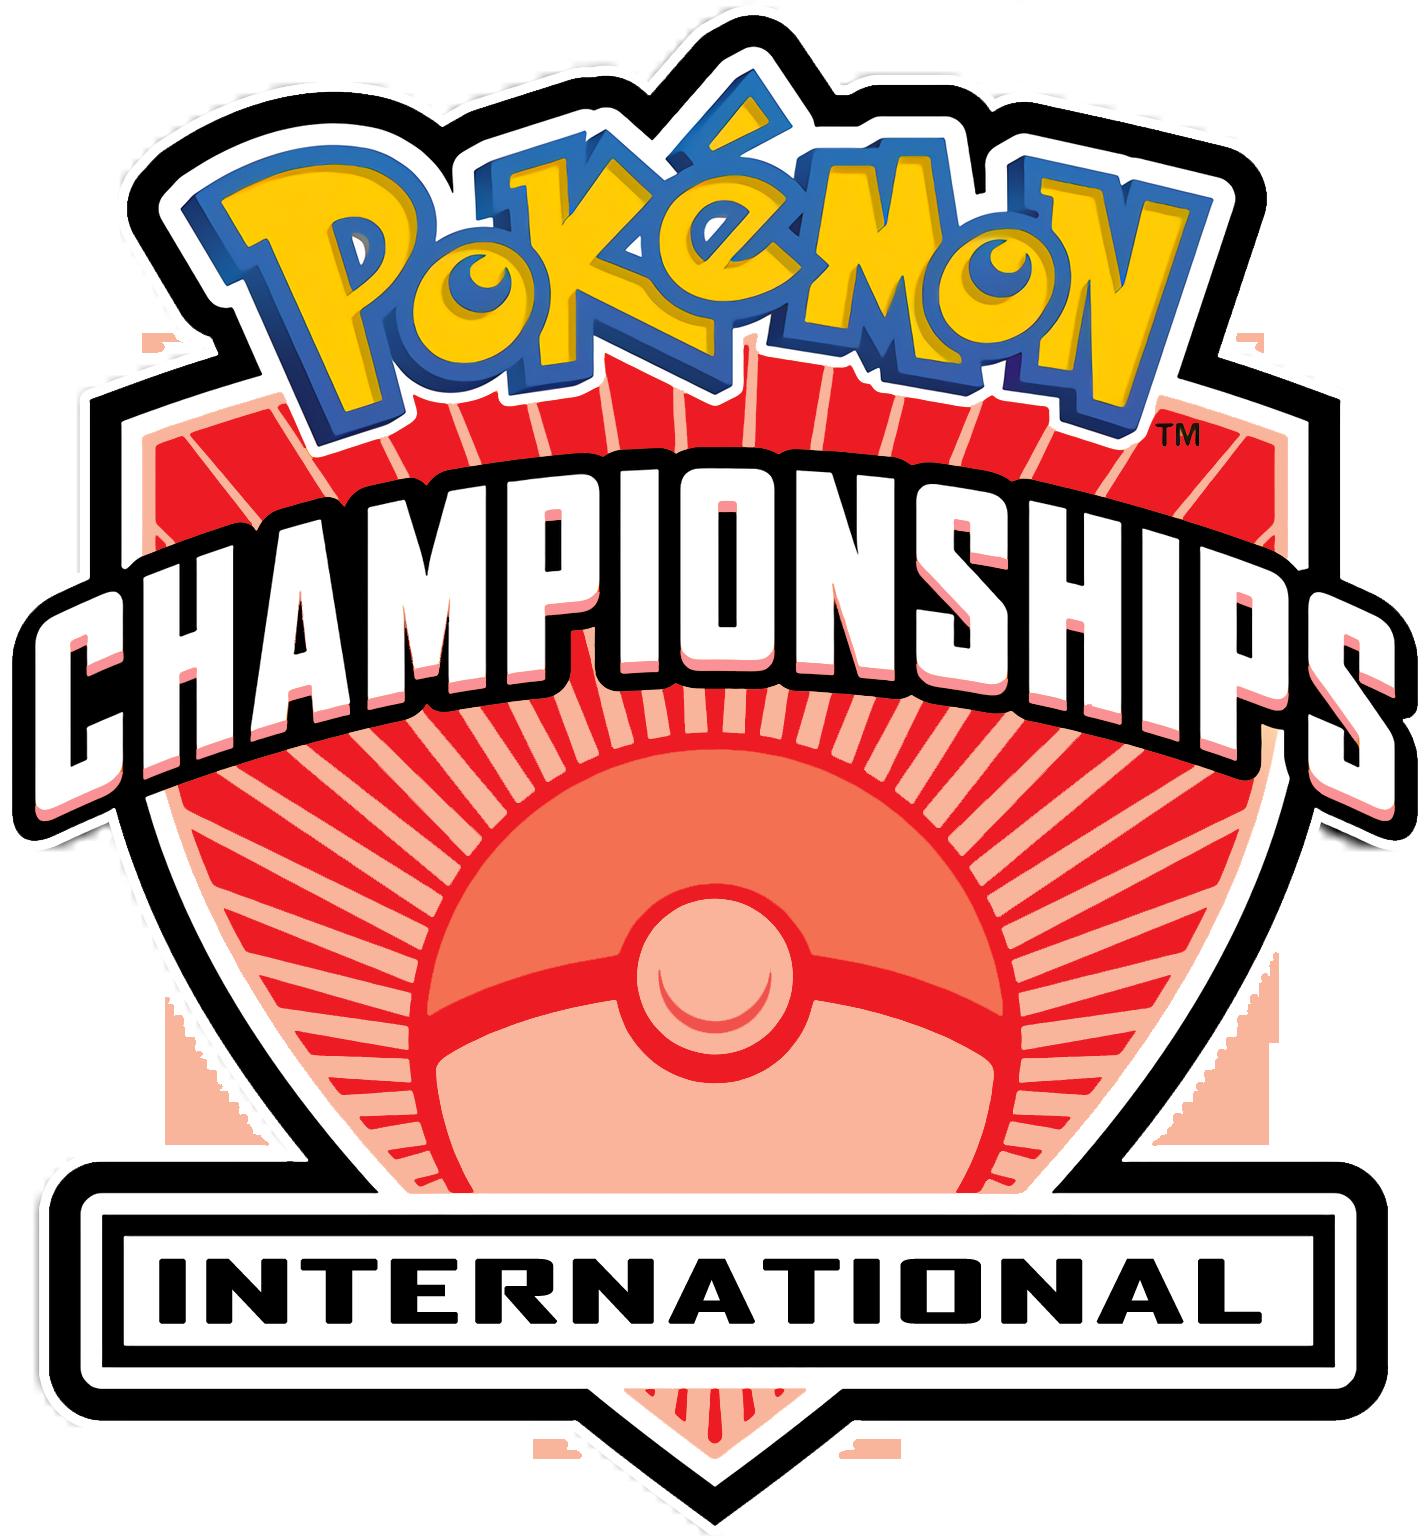 2019 North America Internationals